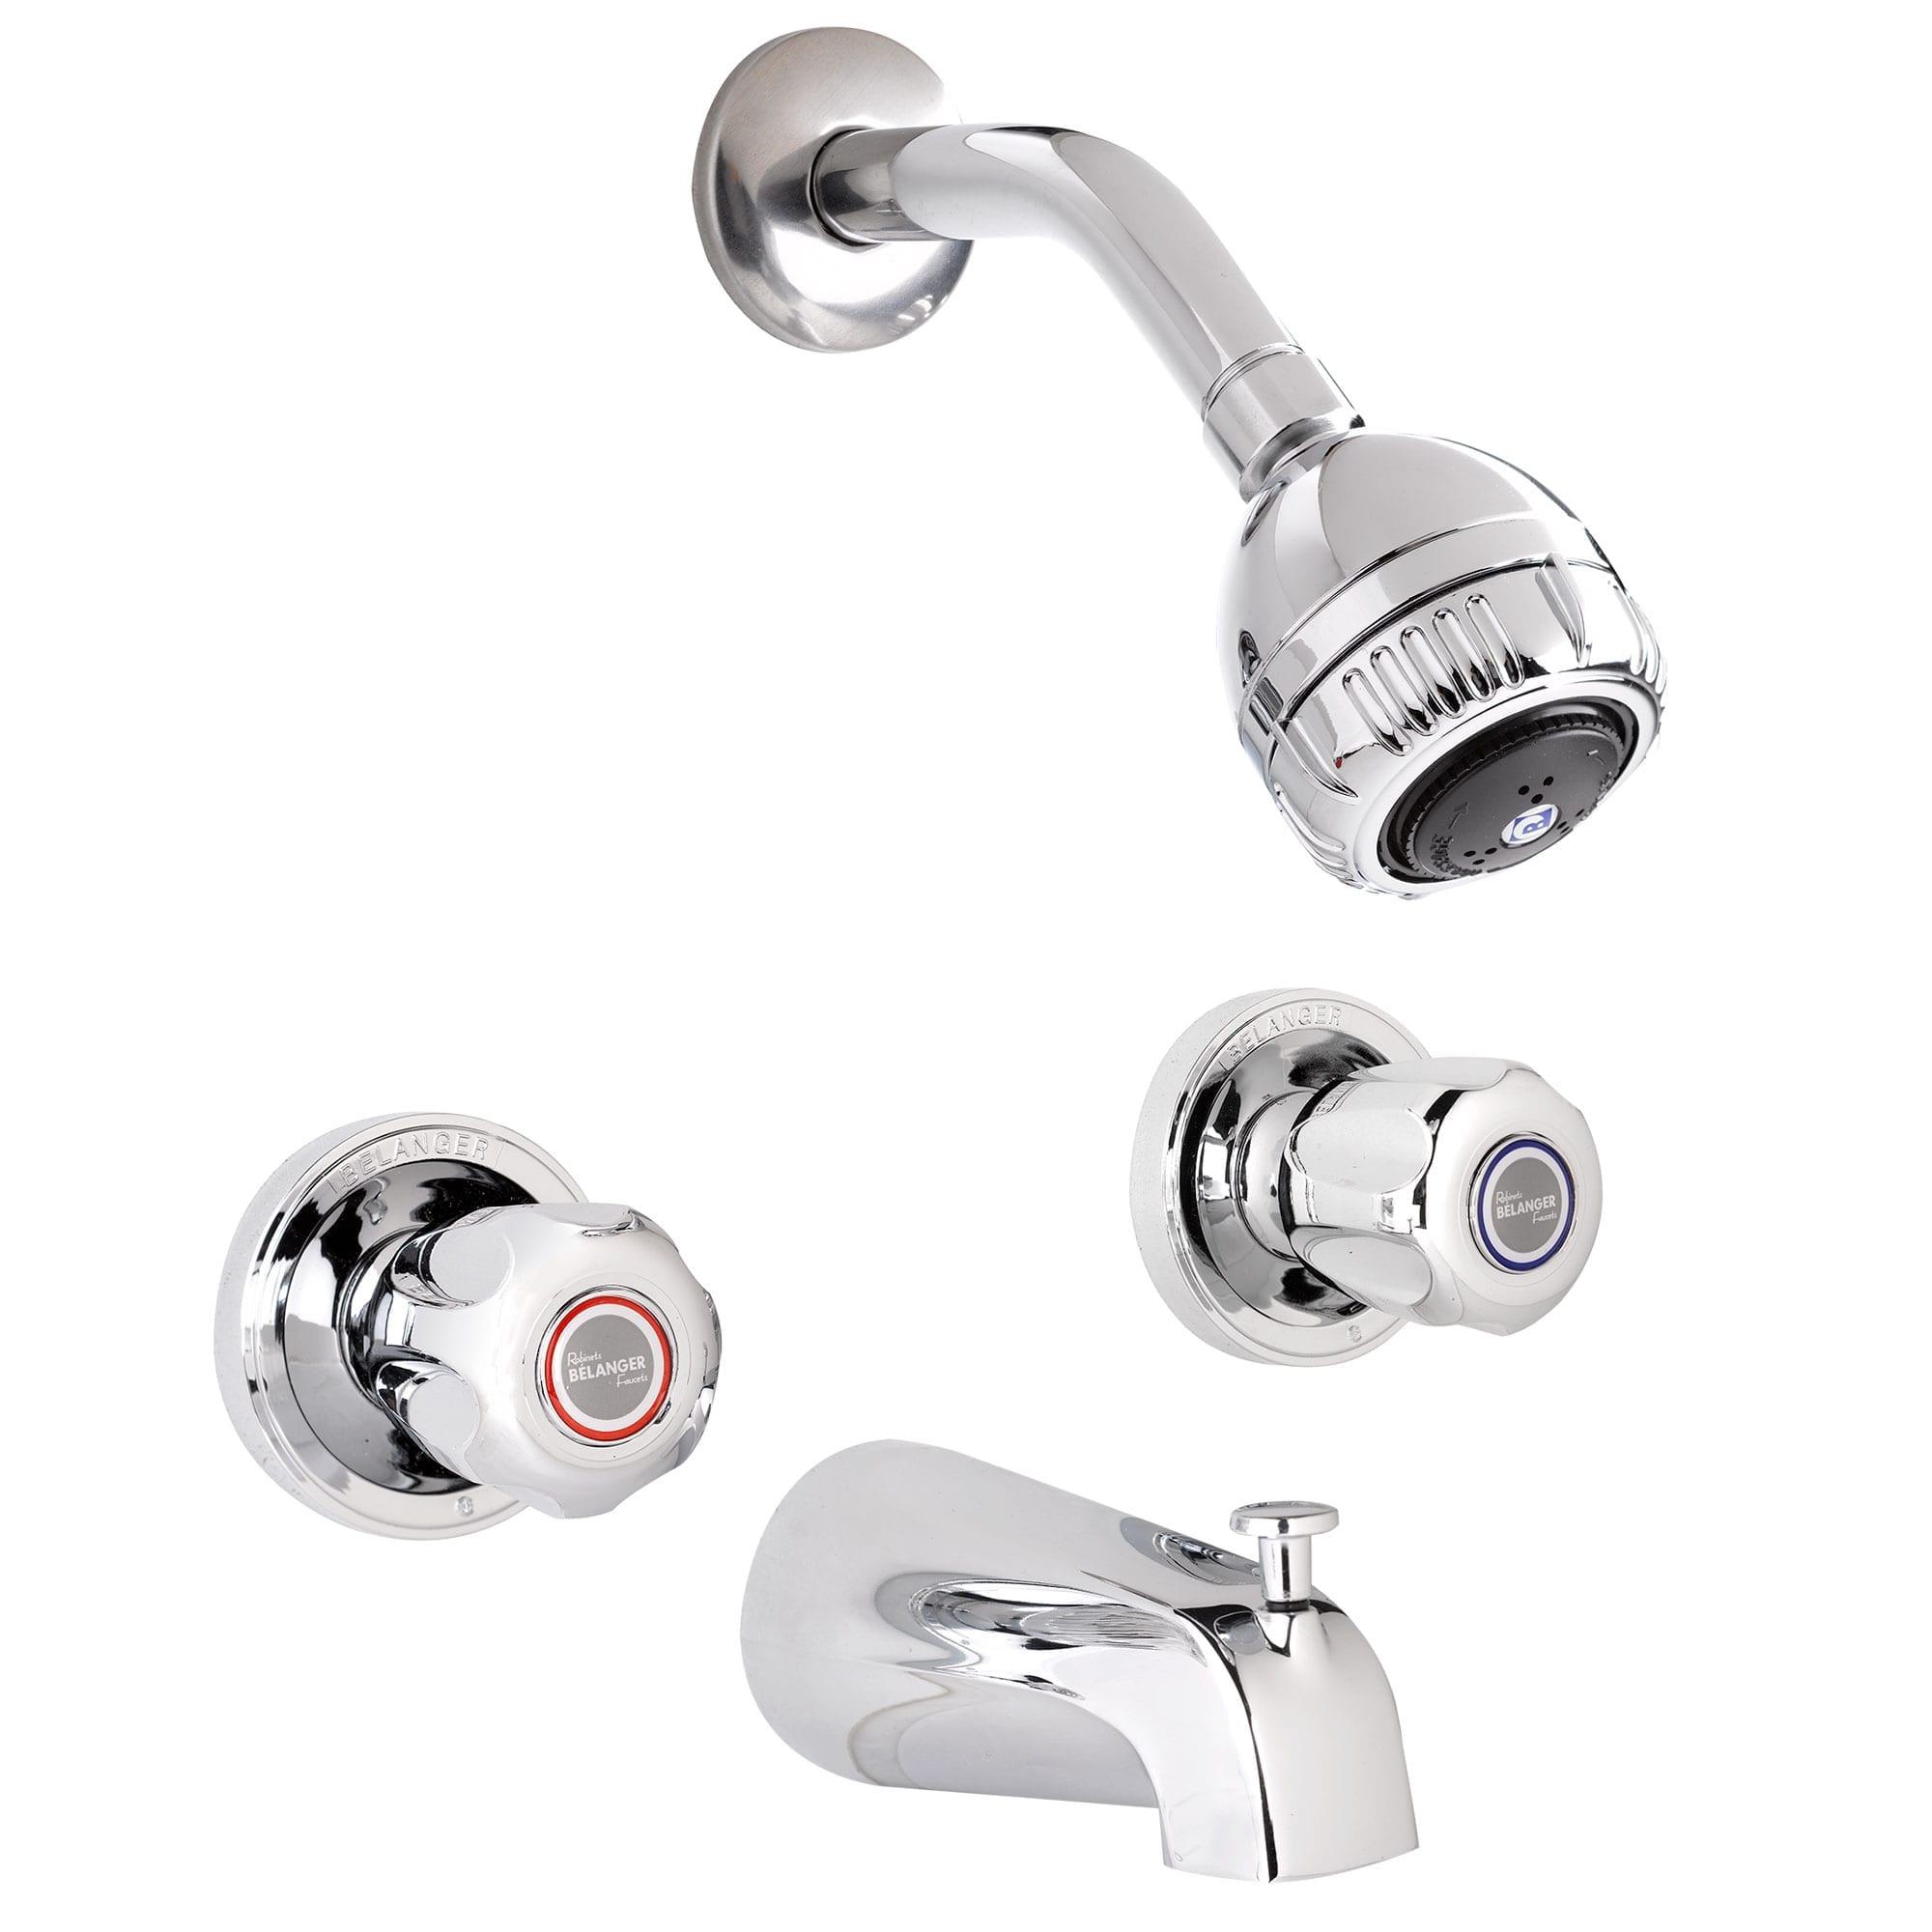 htm and design faucet catalog shower polished house karsen bathtub chrome tub finish